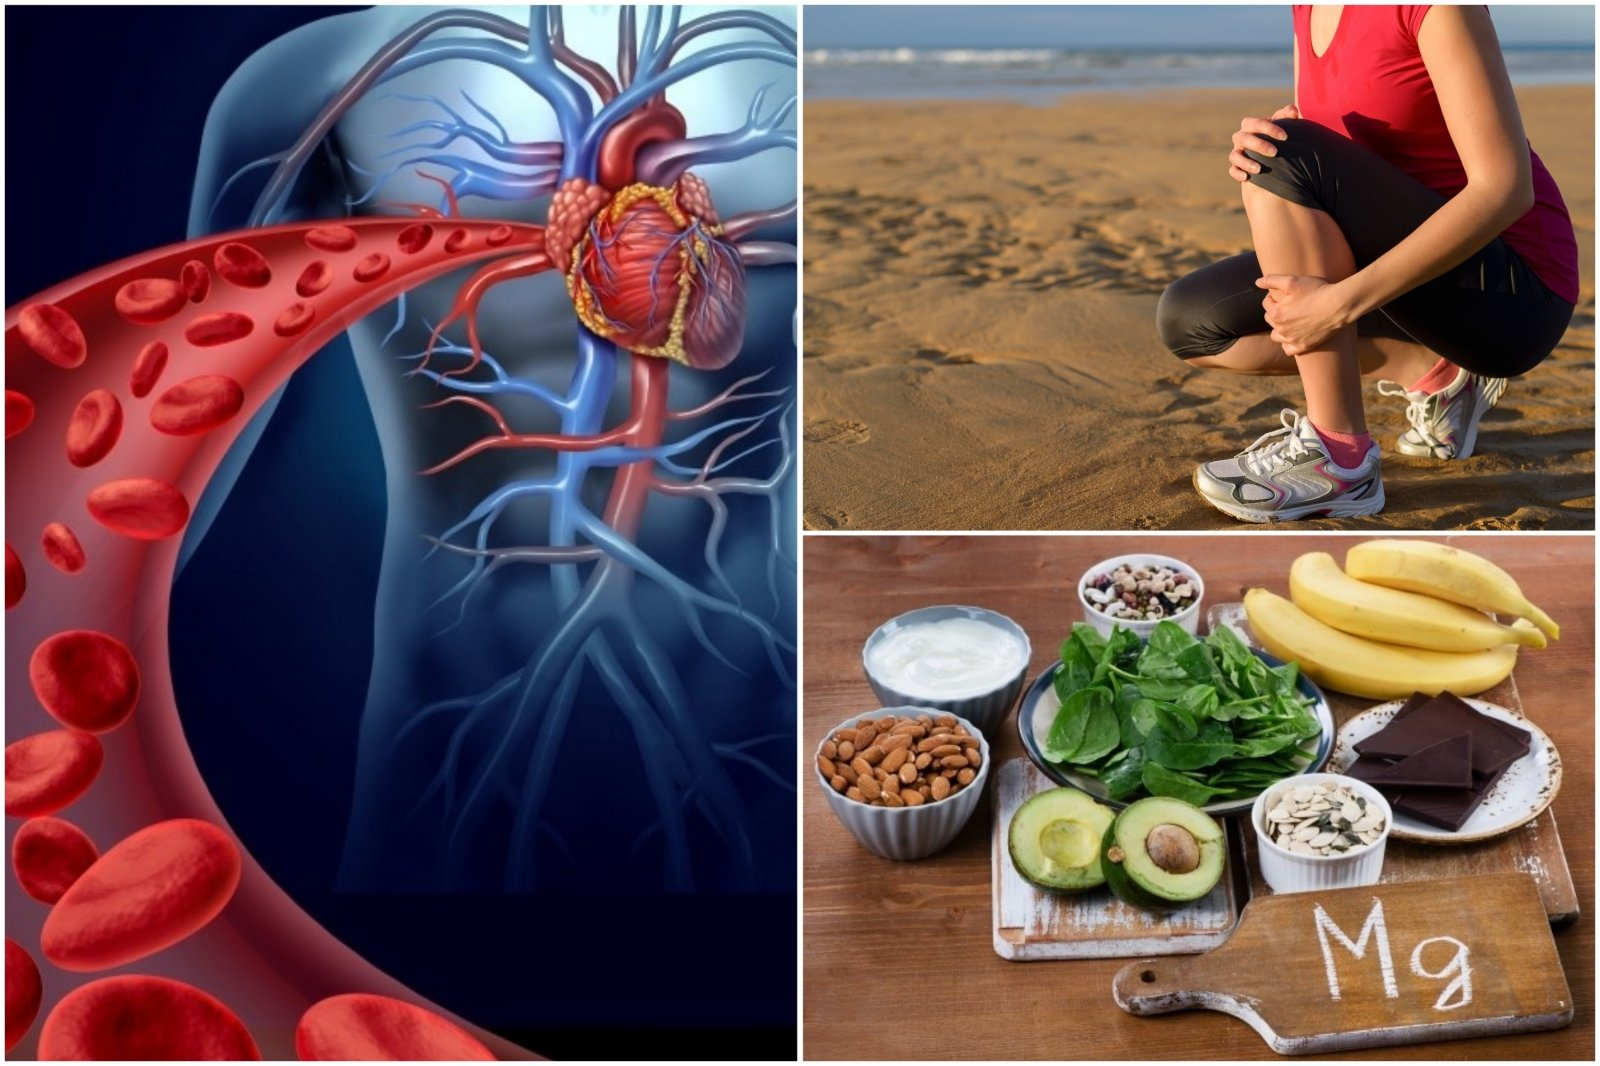 magnio ir vitamino b6 hipertenzija)